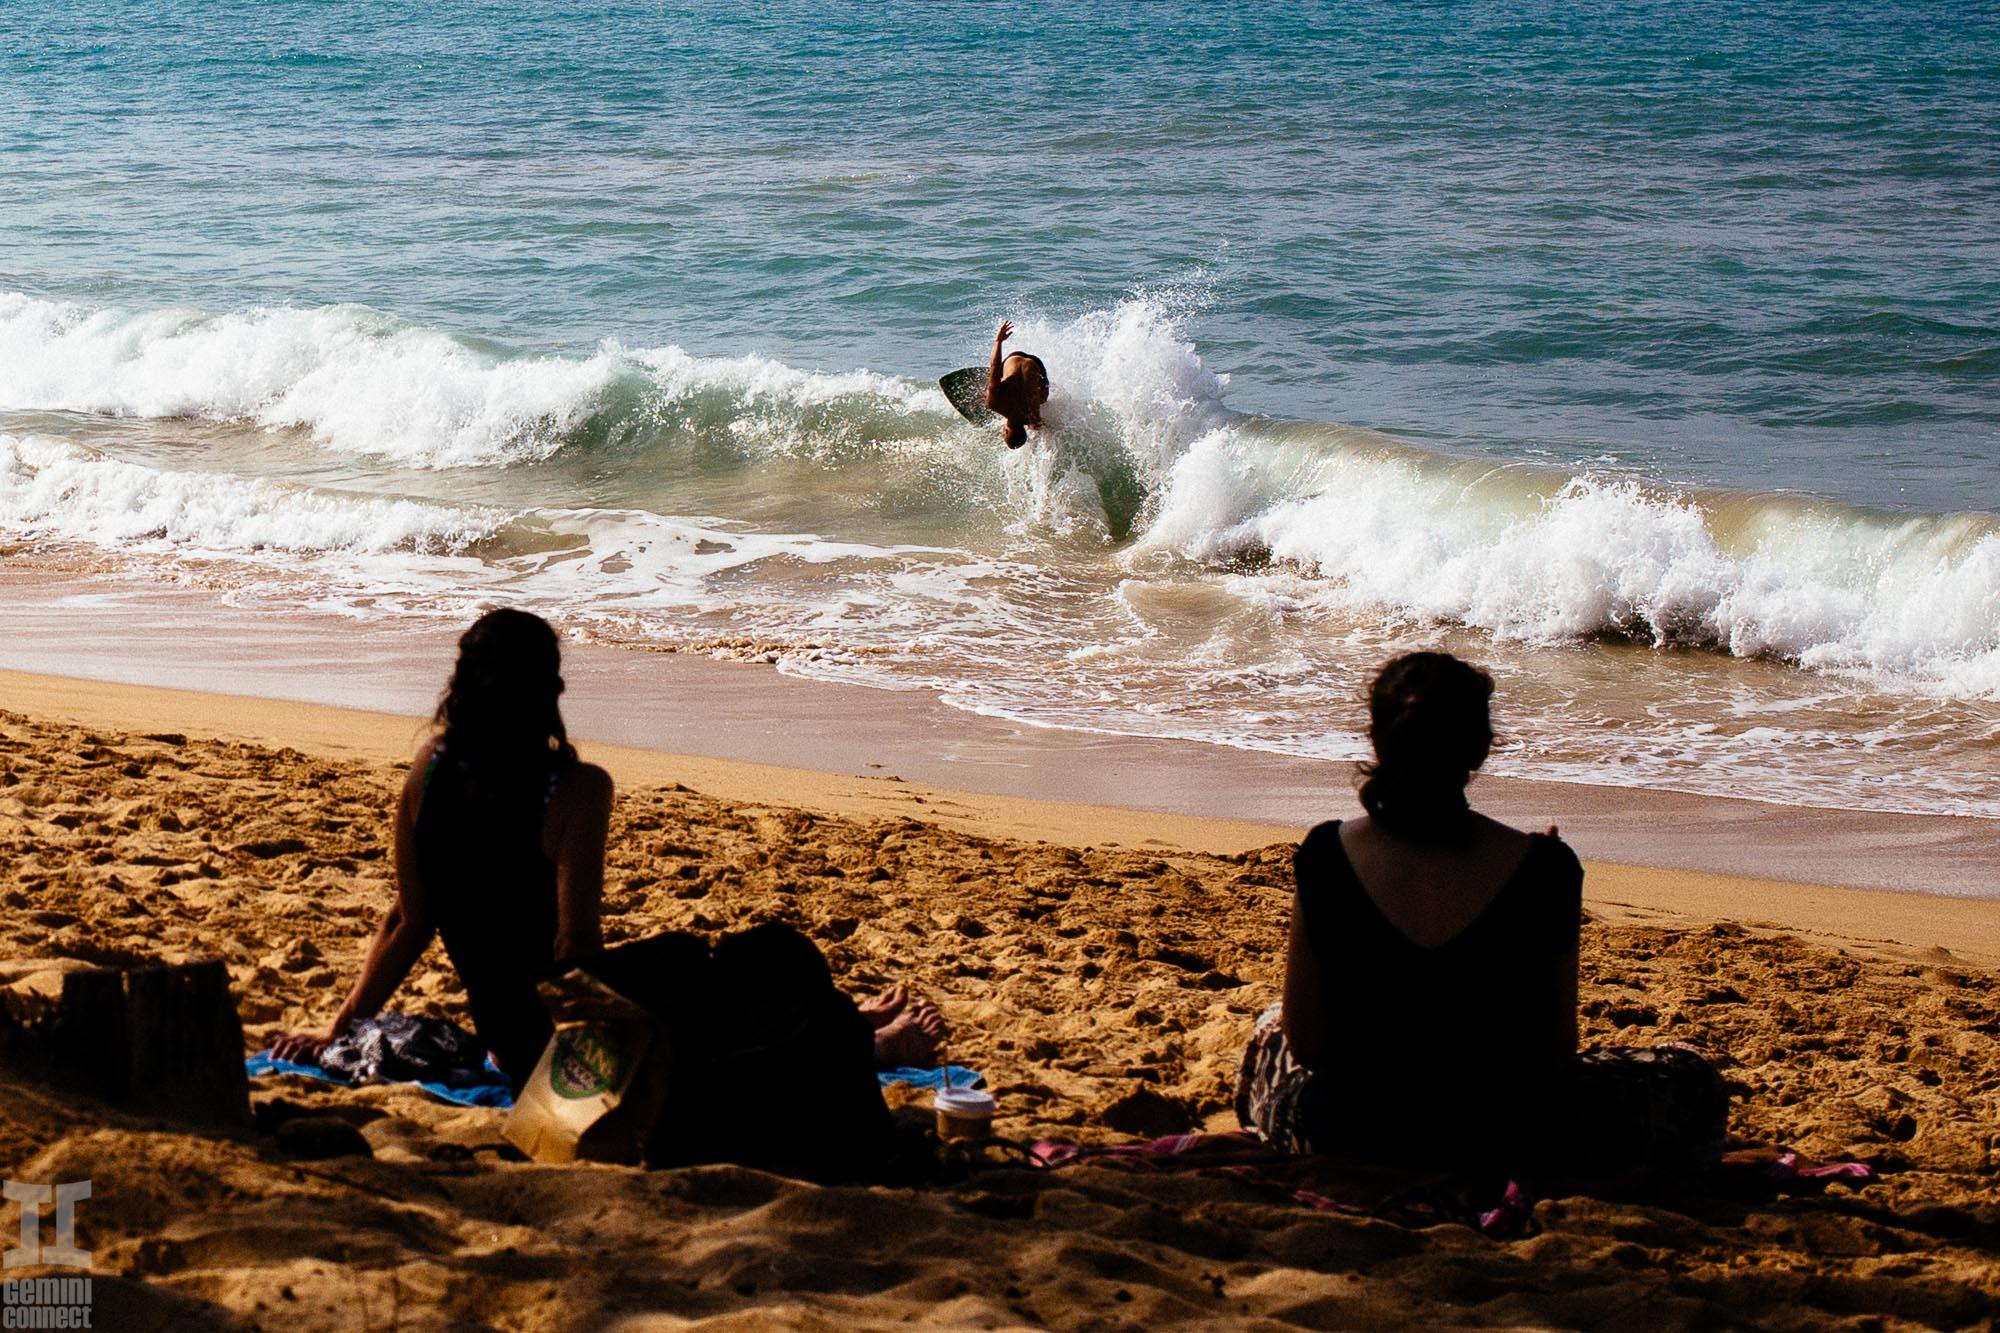 Maui-Hawaii-38.jpg